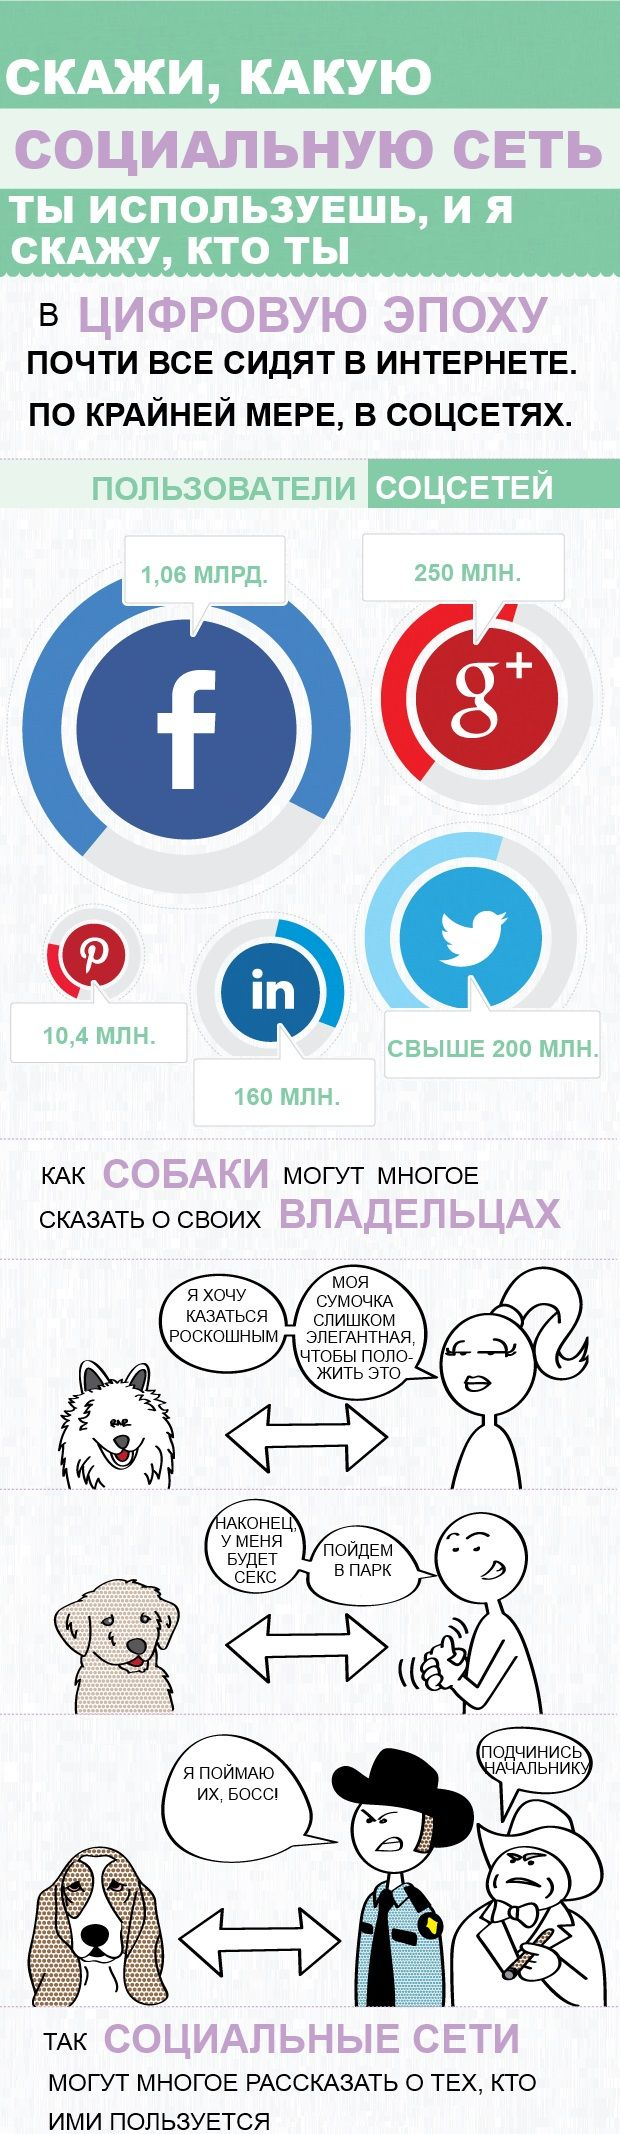 https://social-media-strategy-template.blogspot.com/ #SocialMedia Инфографика: типы личности в социальных сетях